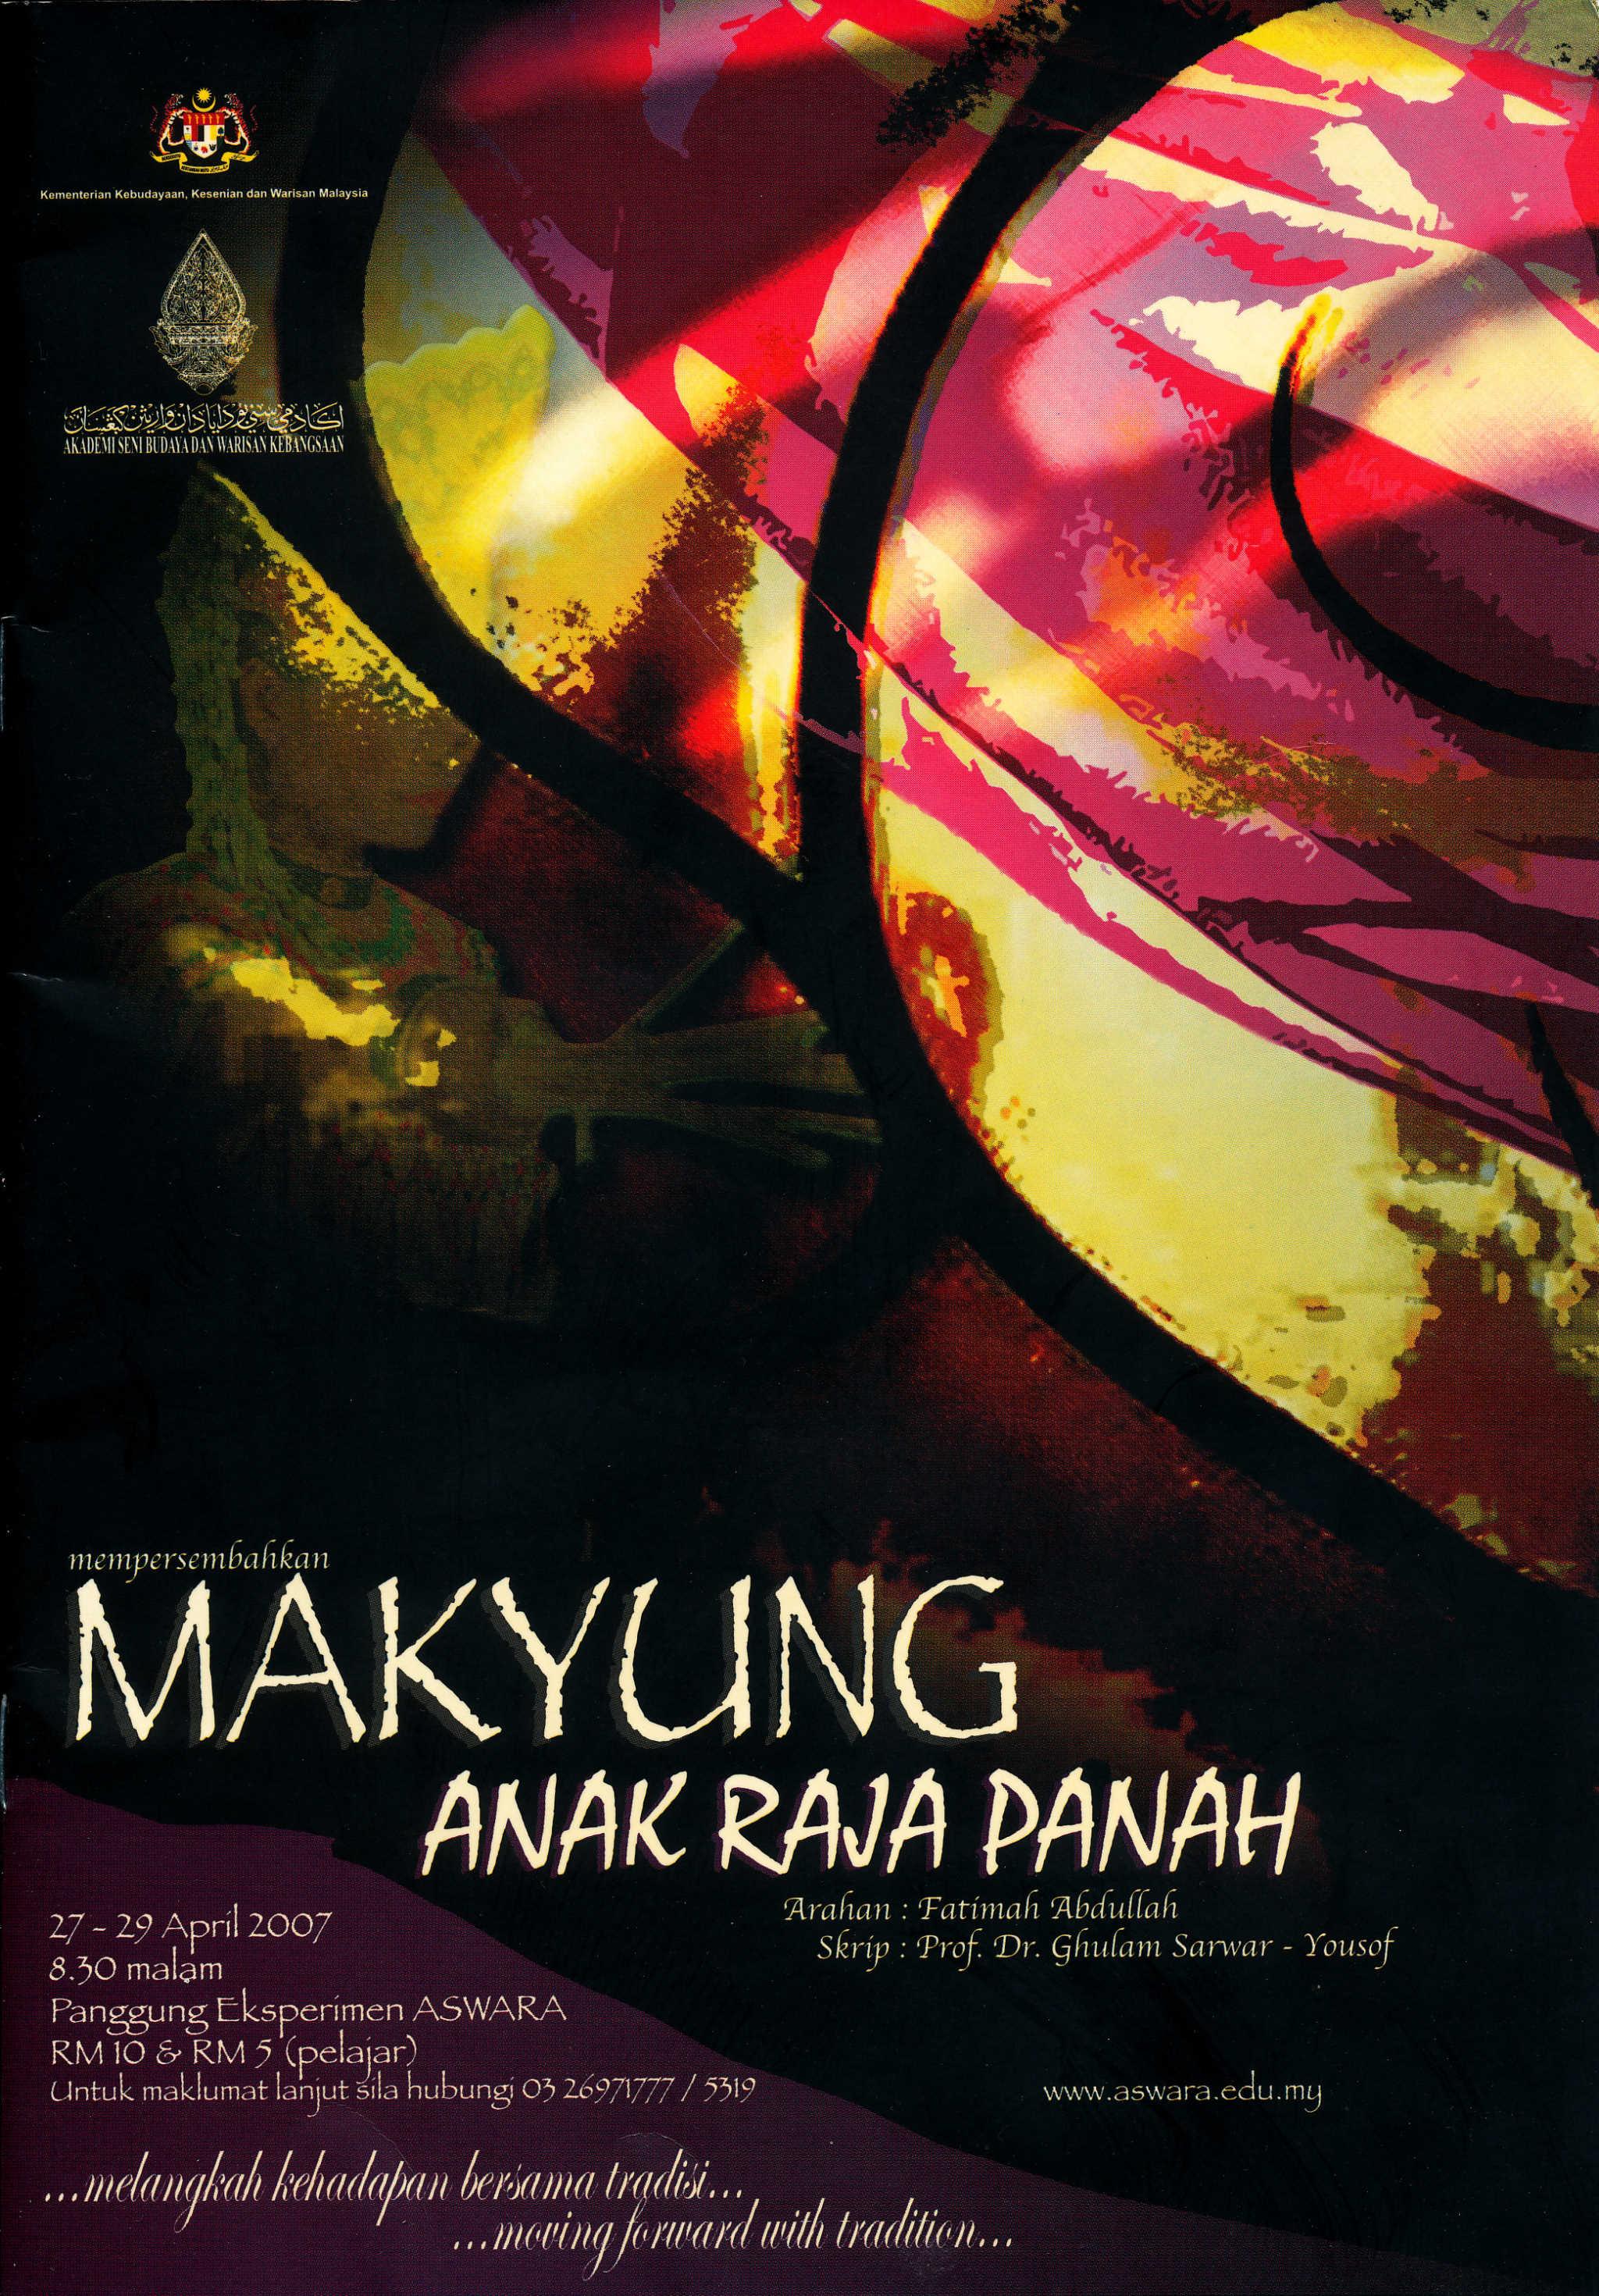 2007 Makyung Anak Raja Panah Cover